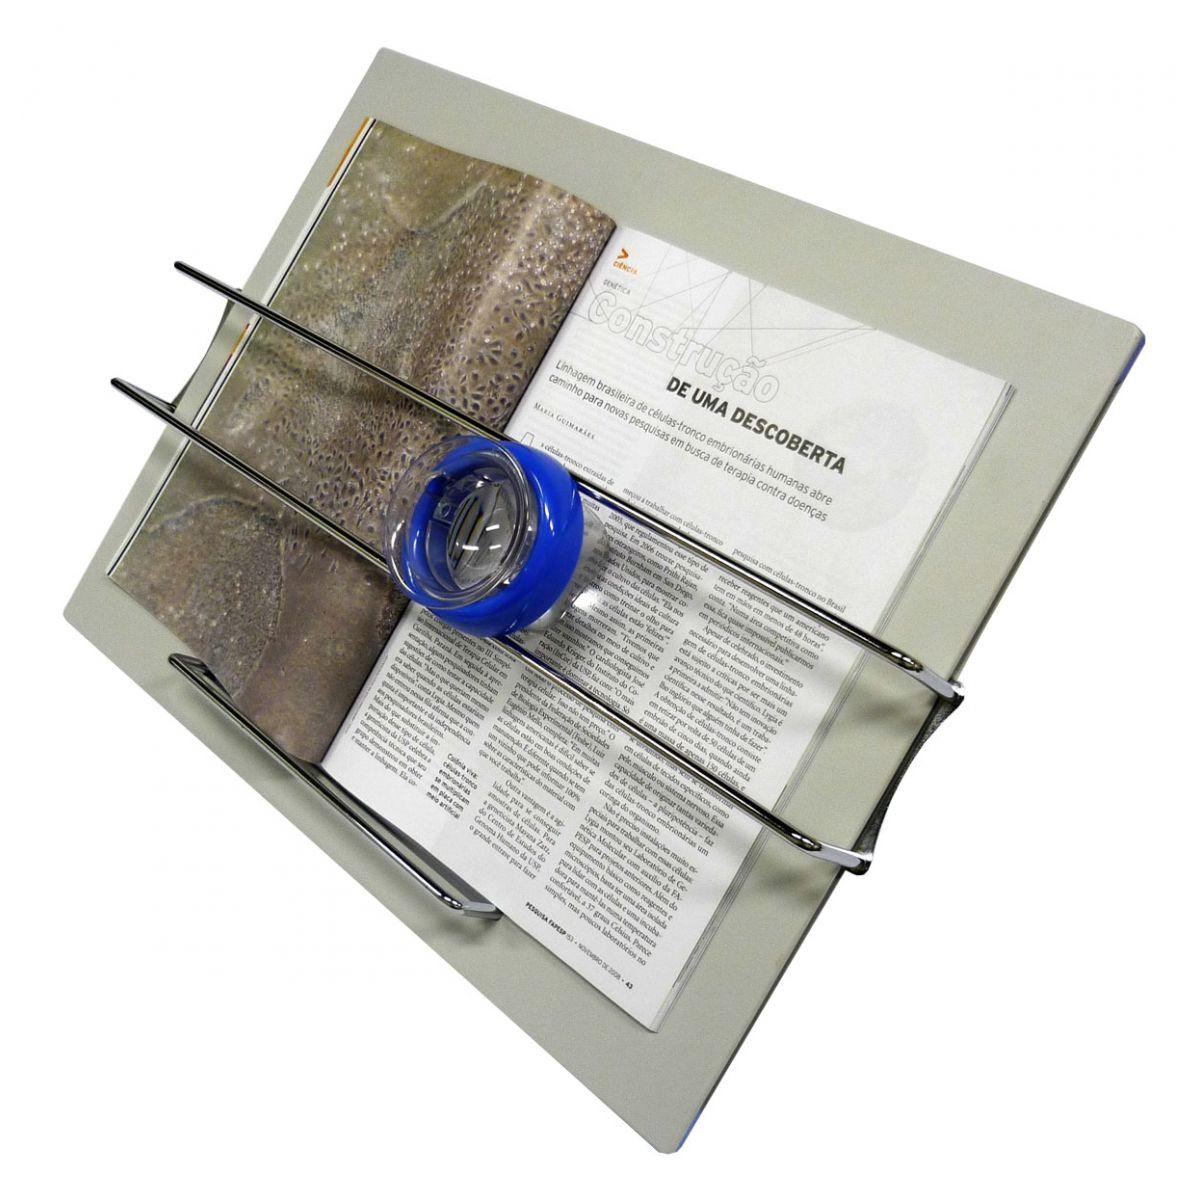 Prancha de Leitura com Lupa 6X